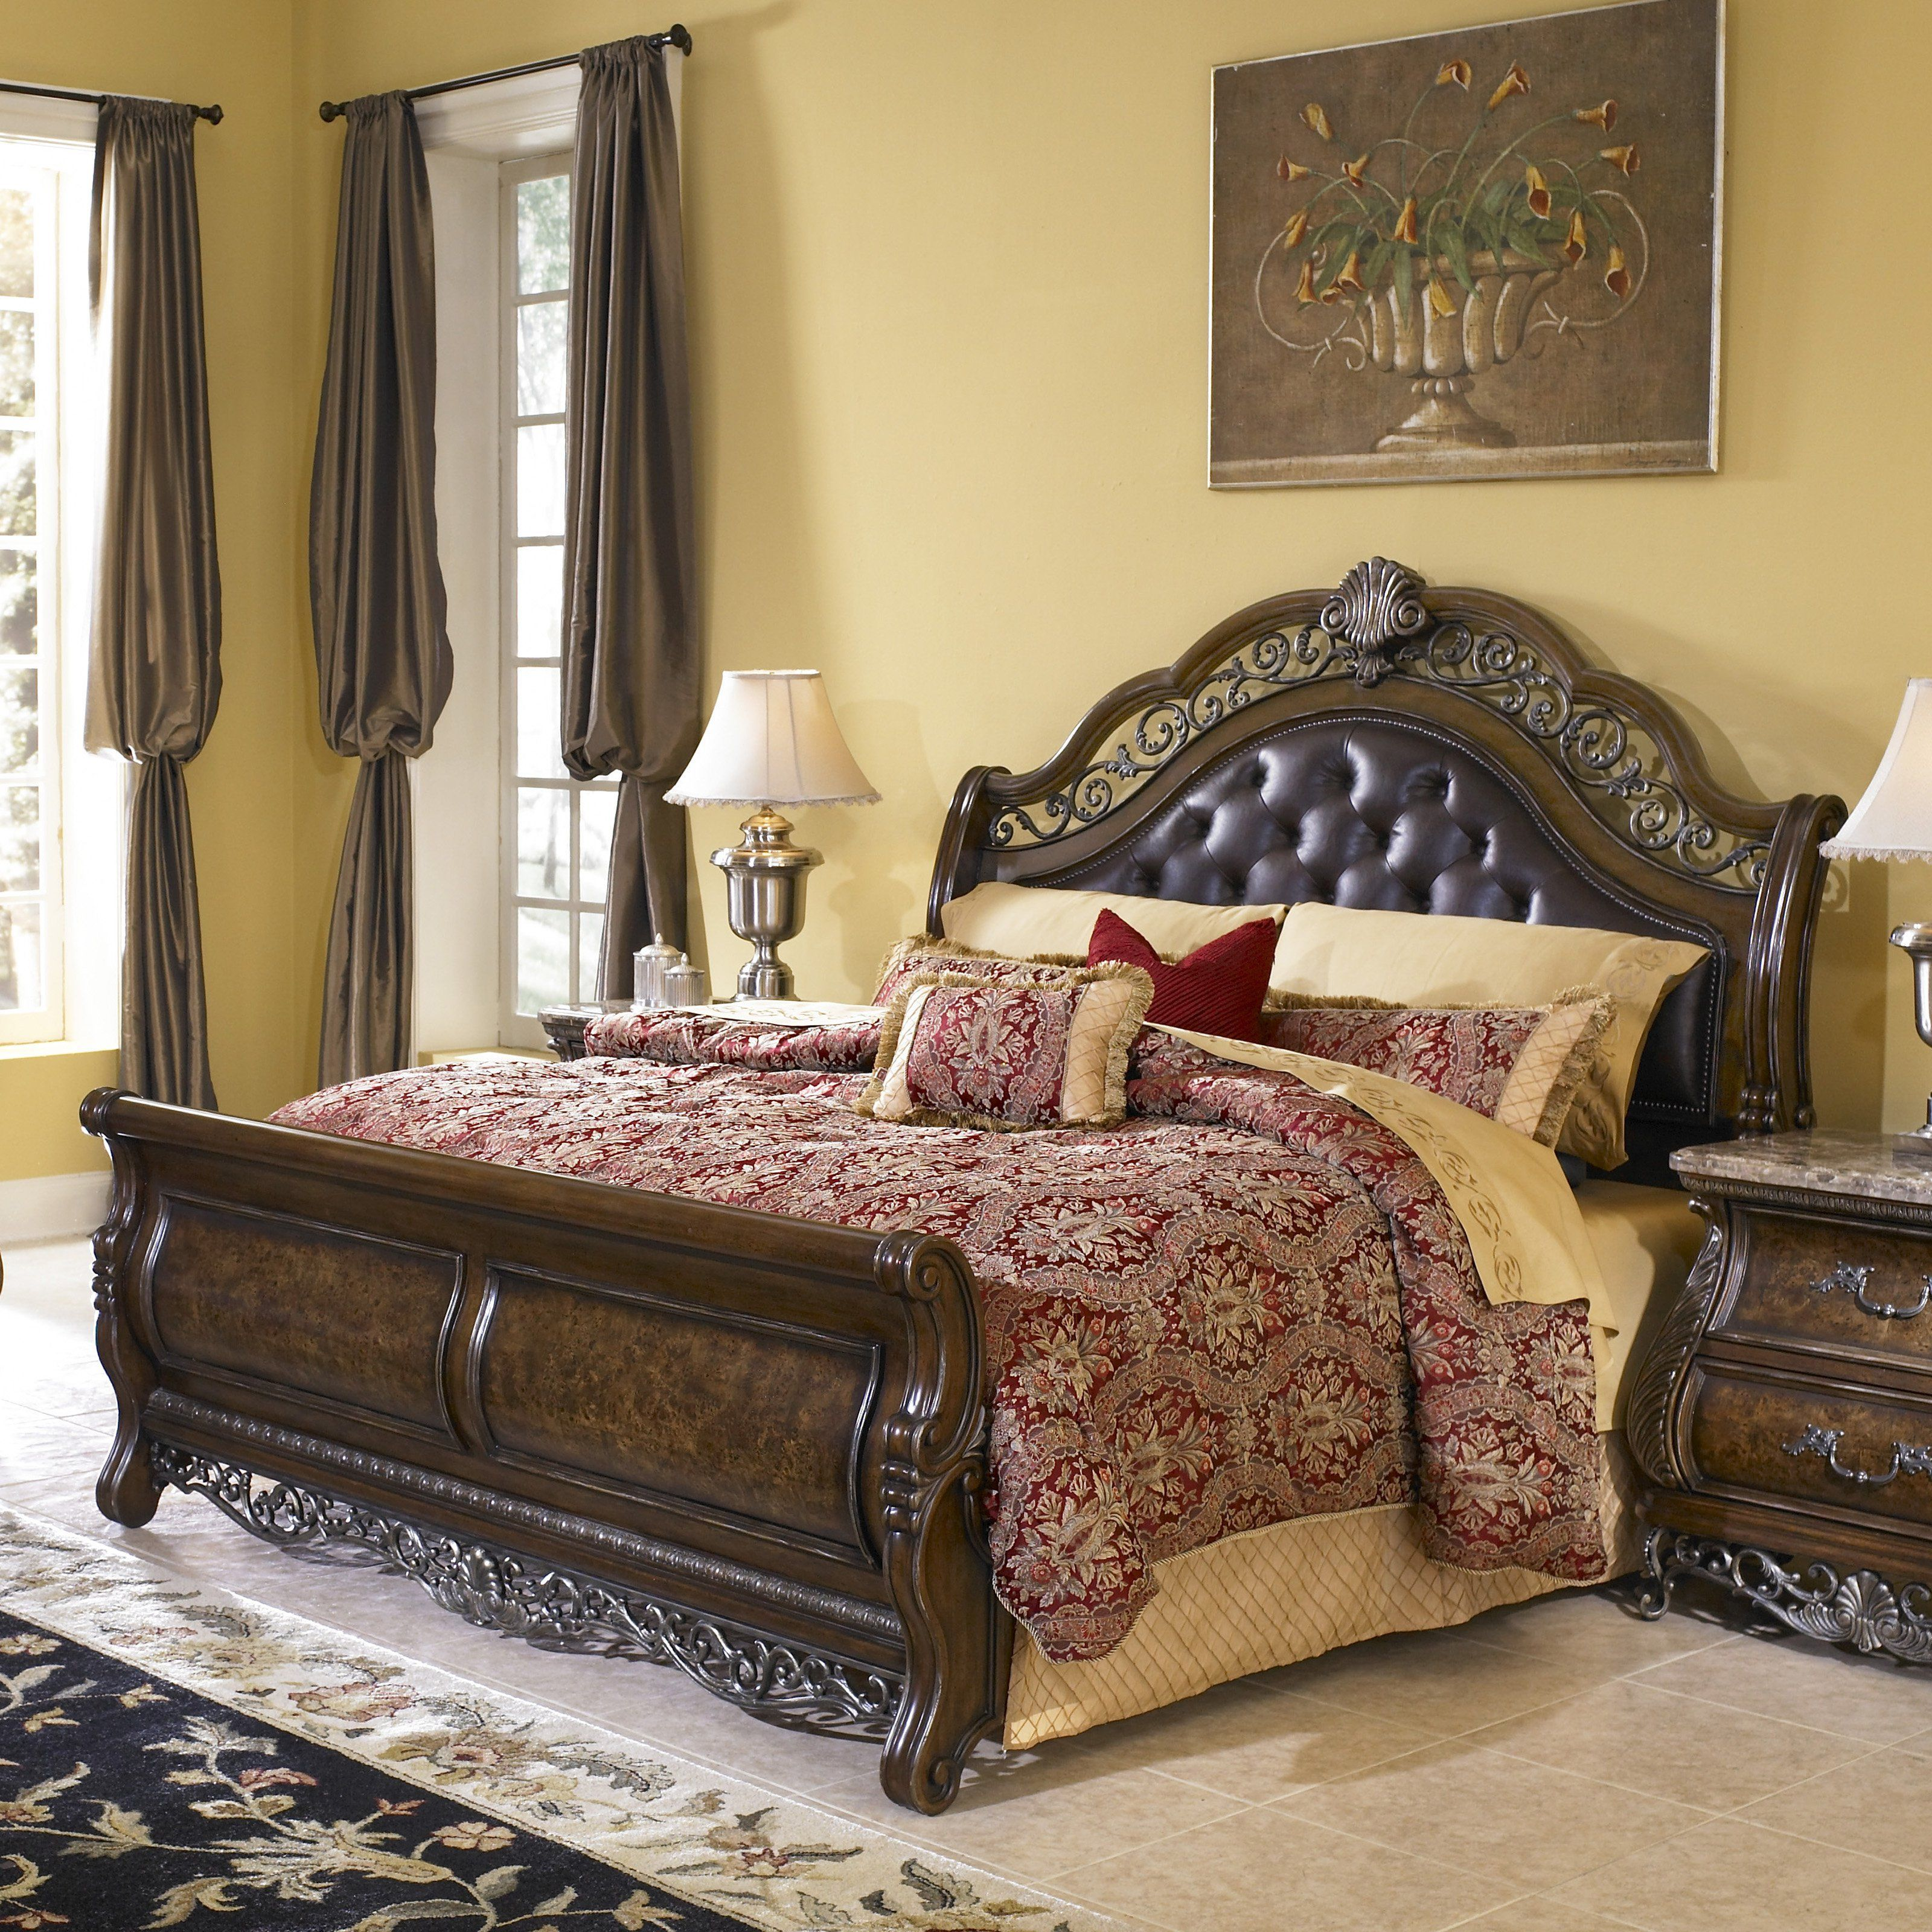 Pulaski Birkhaven Sleigh Bed HOMM881 Bedroom set